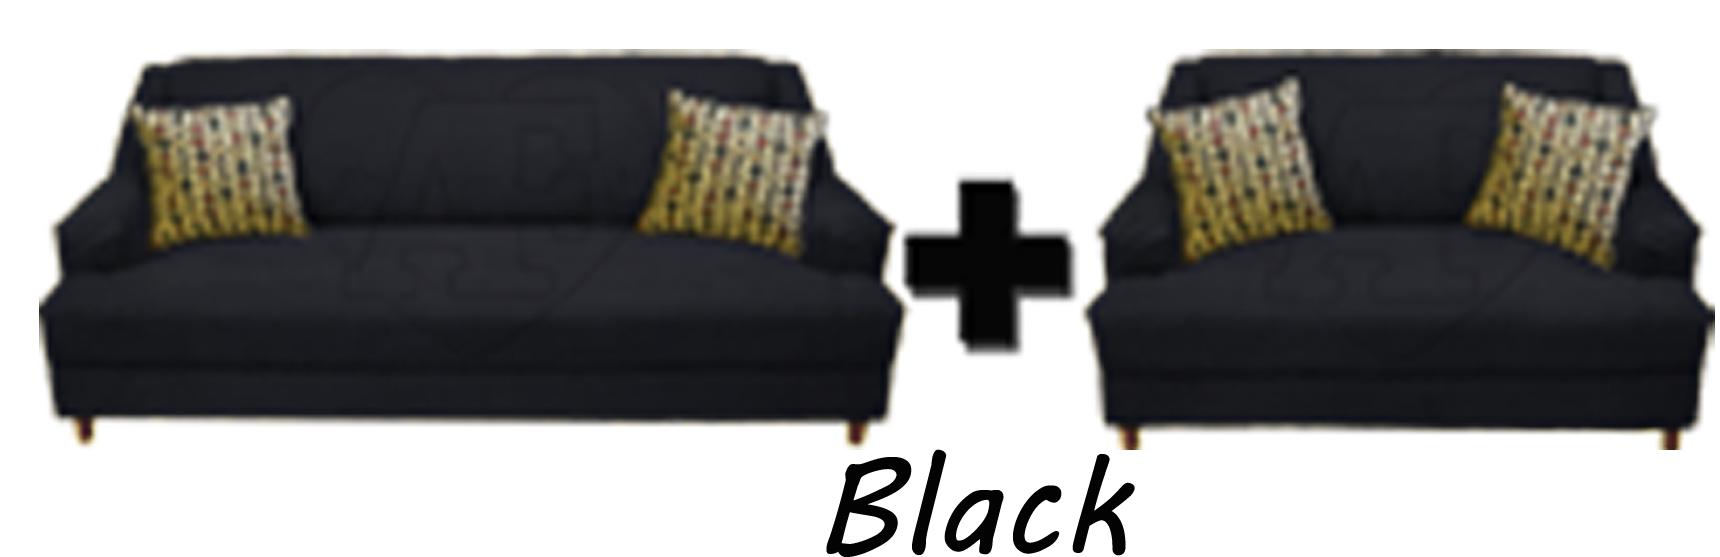 https://0201.nccdn.net/4_2/000/000/046/6ea/Model-127-Black.png